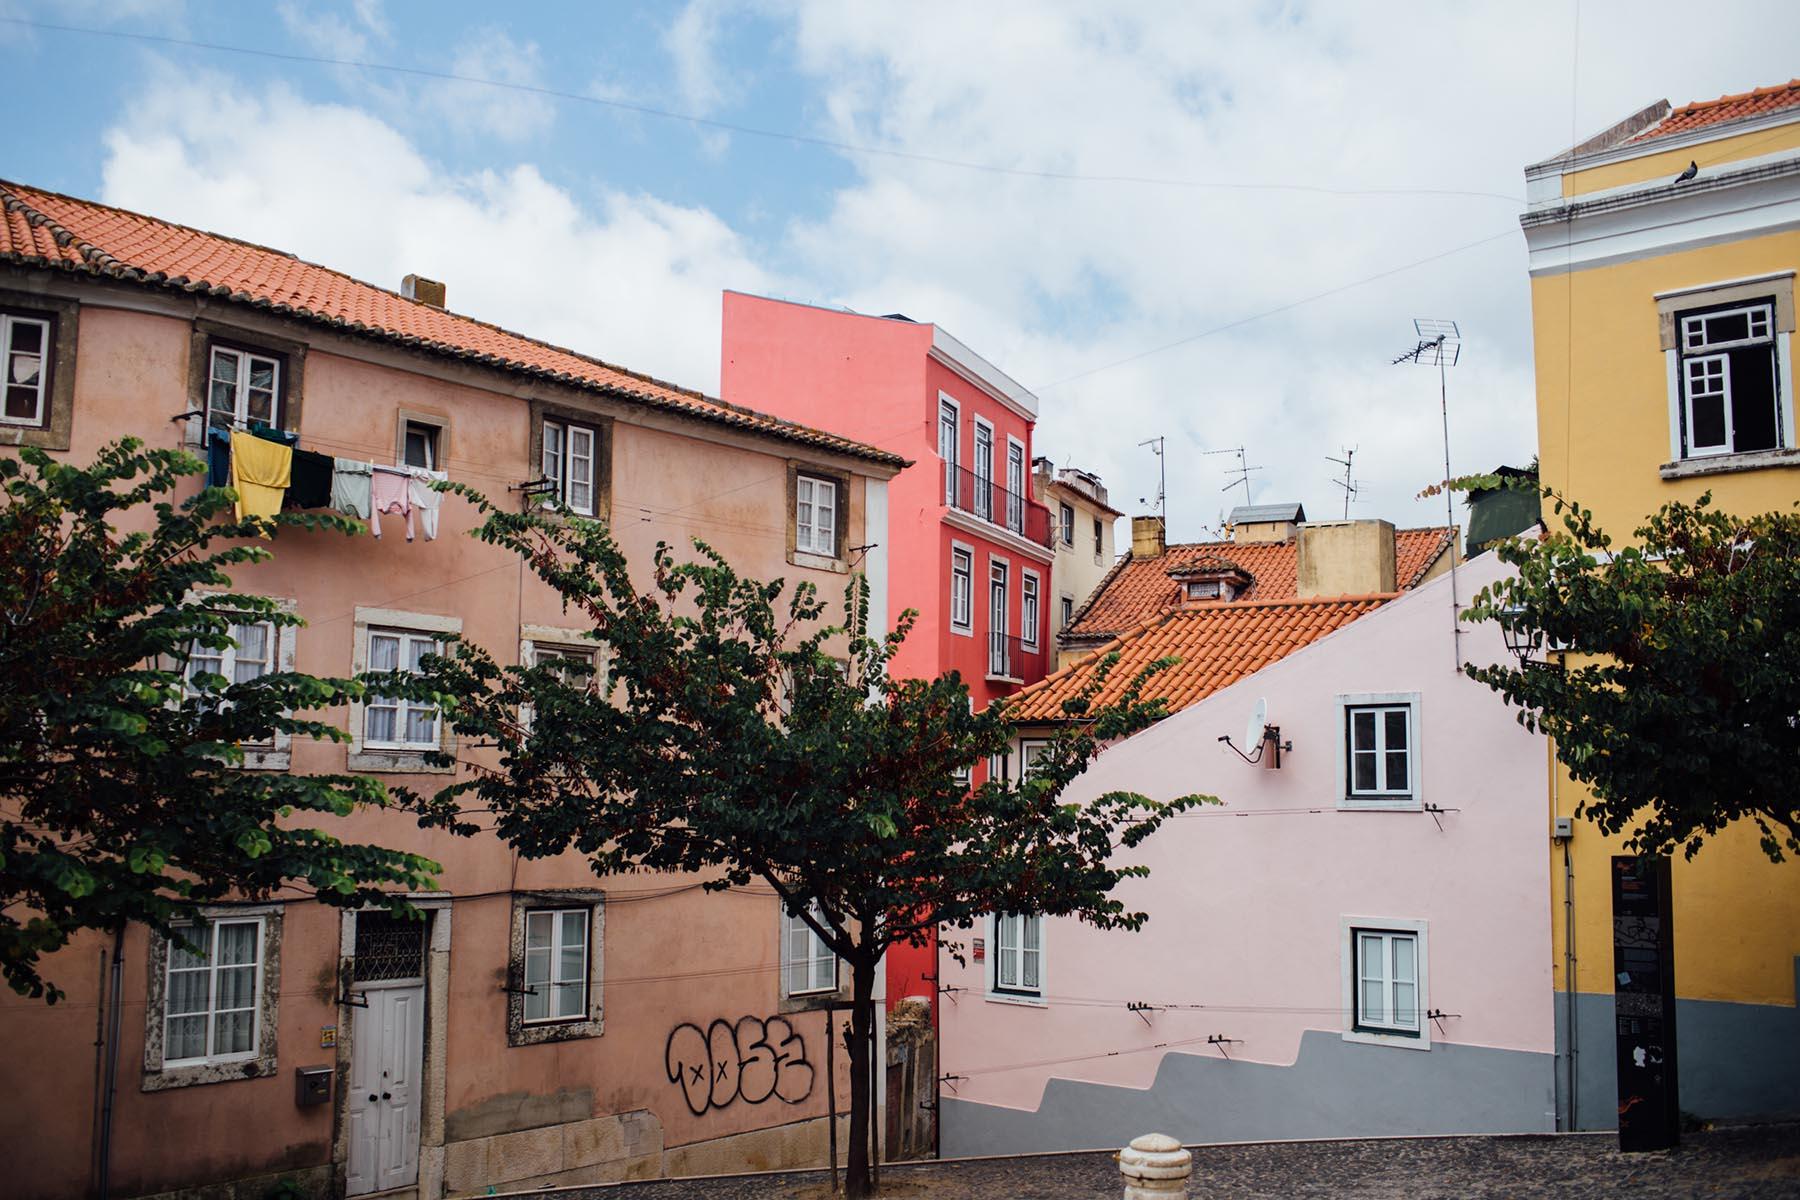 lissabon_streets_05.jpg